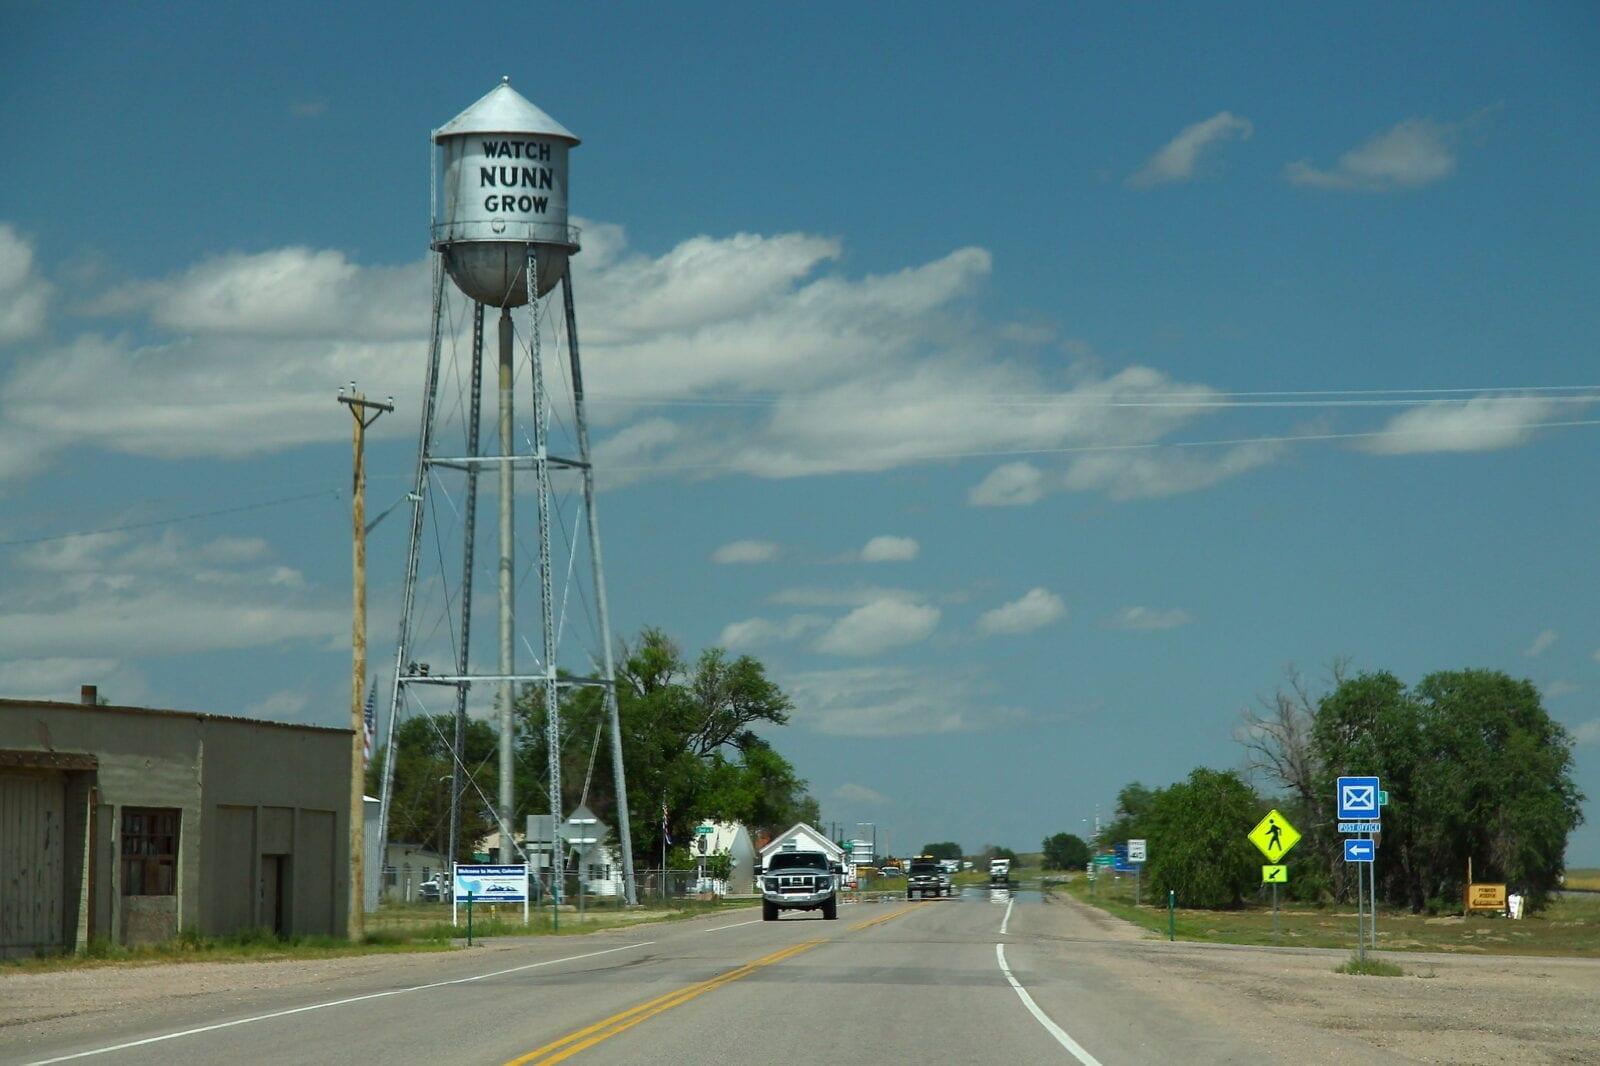 image of nunn water tower